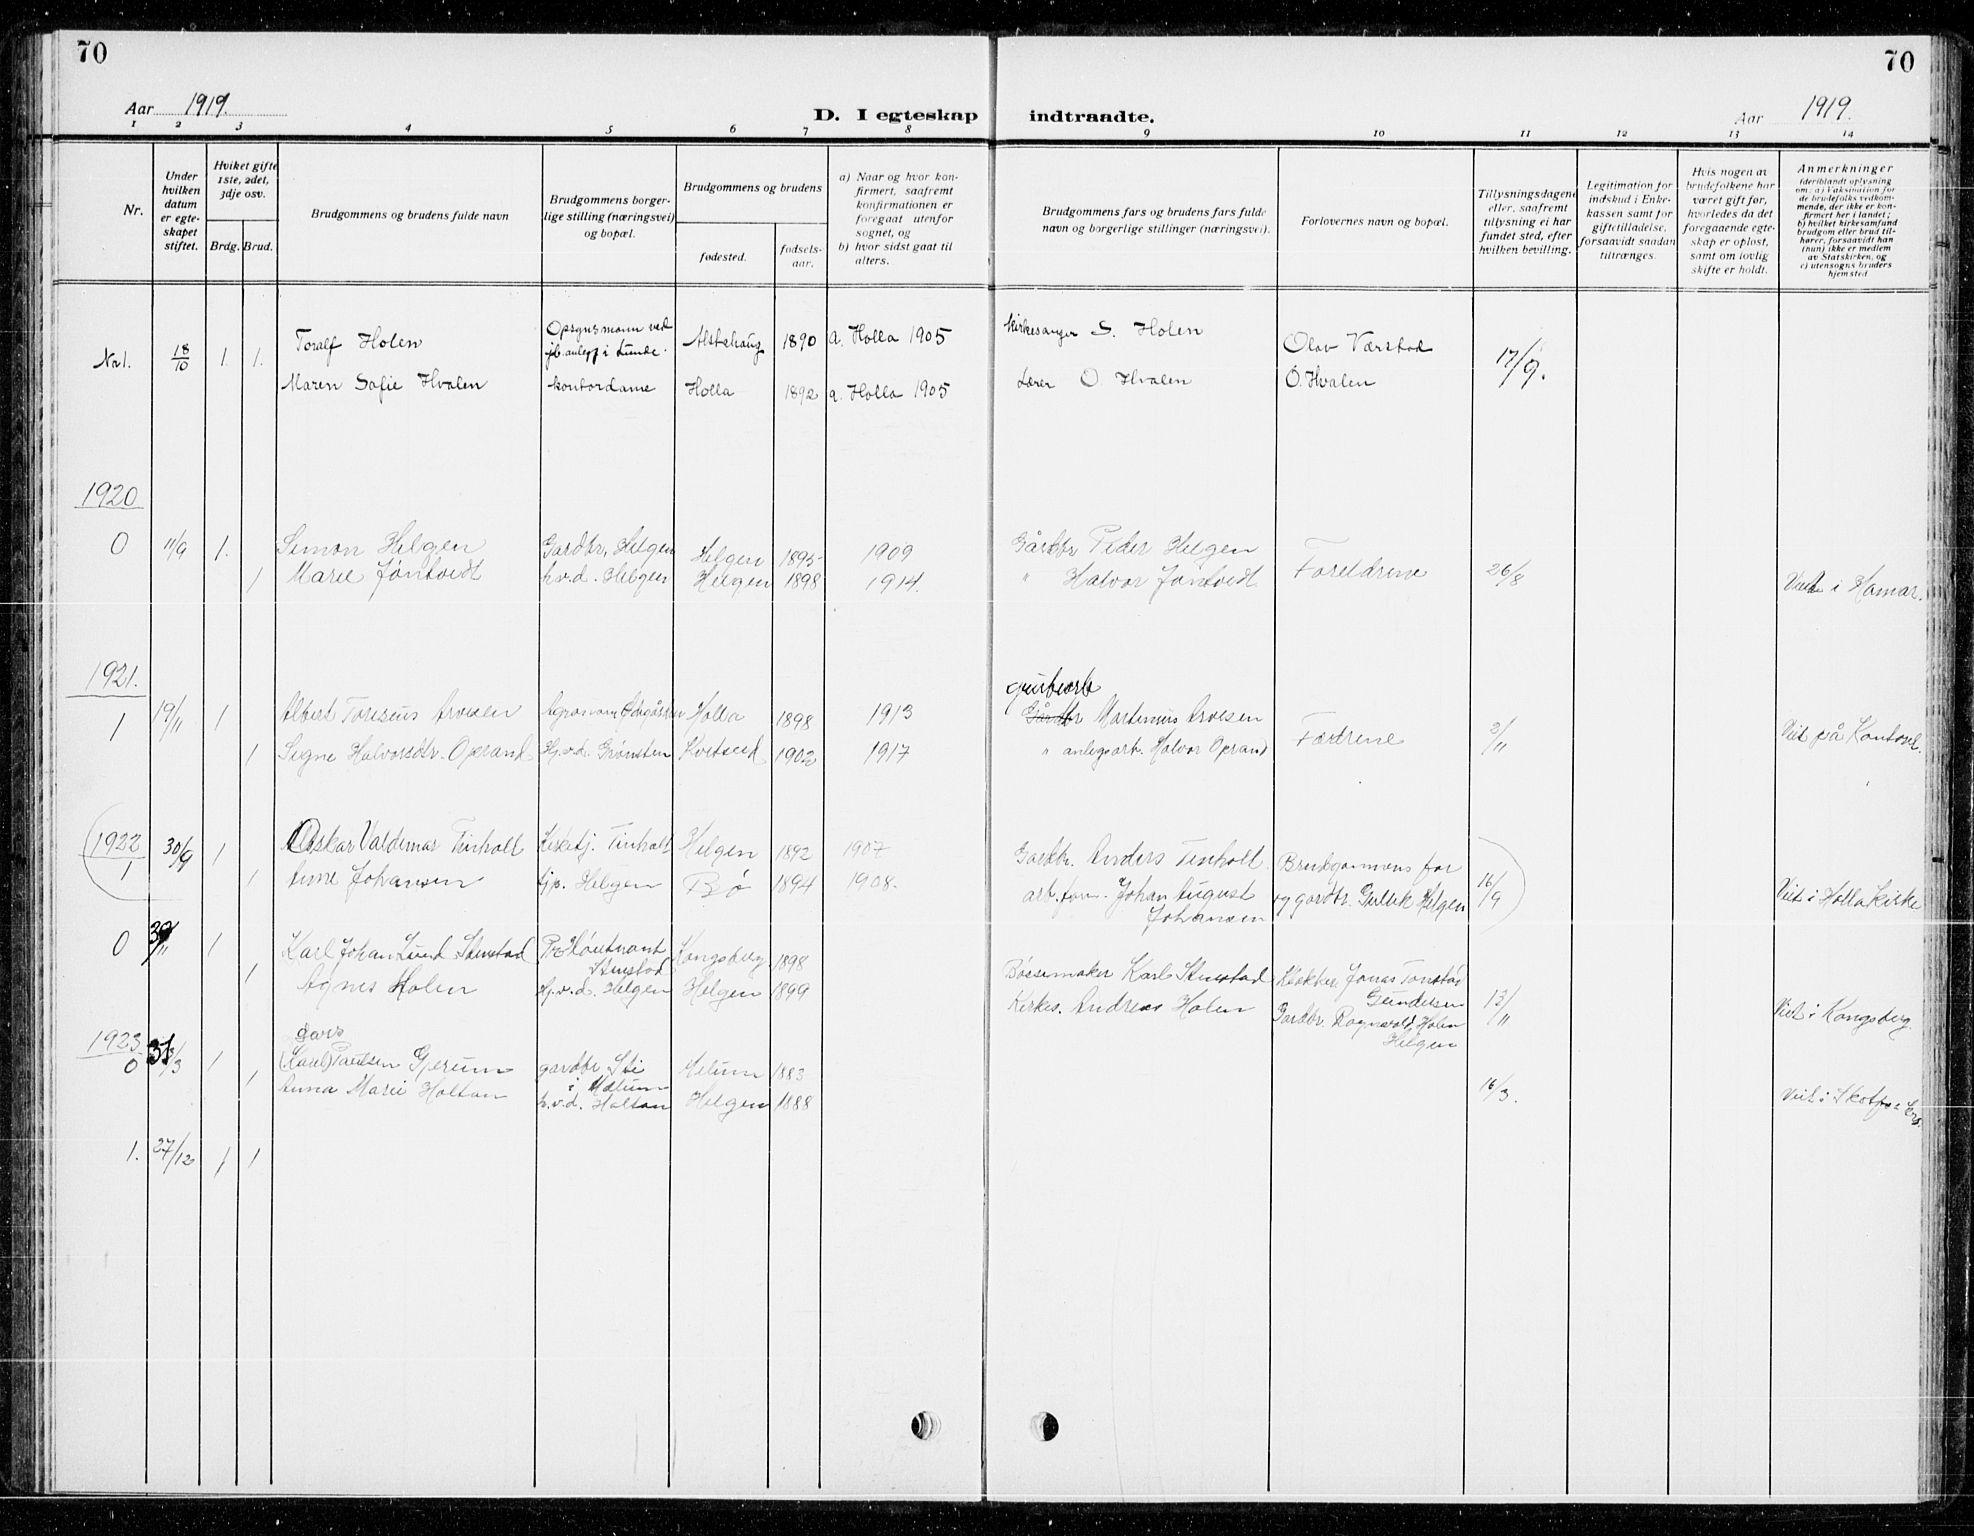 SAKO, Holla kirkebøker, G/Gb/L0003: Klokkerbok nr. II 3, 1914-1941, s. 70